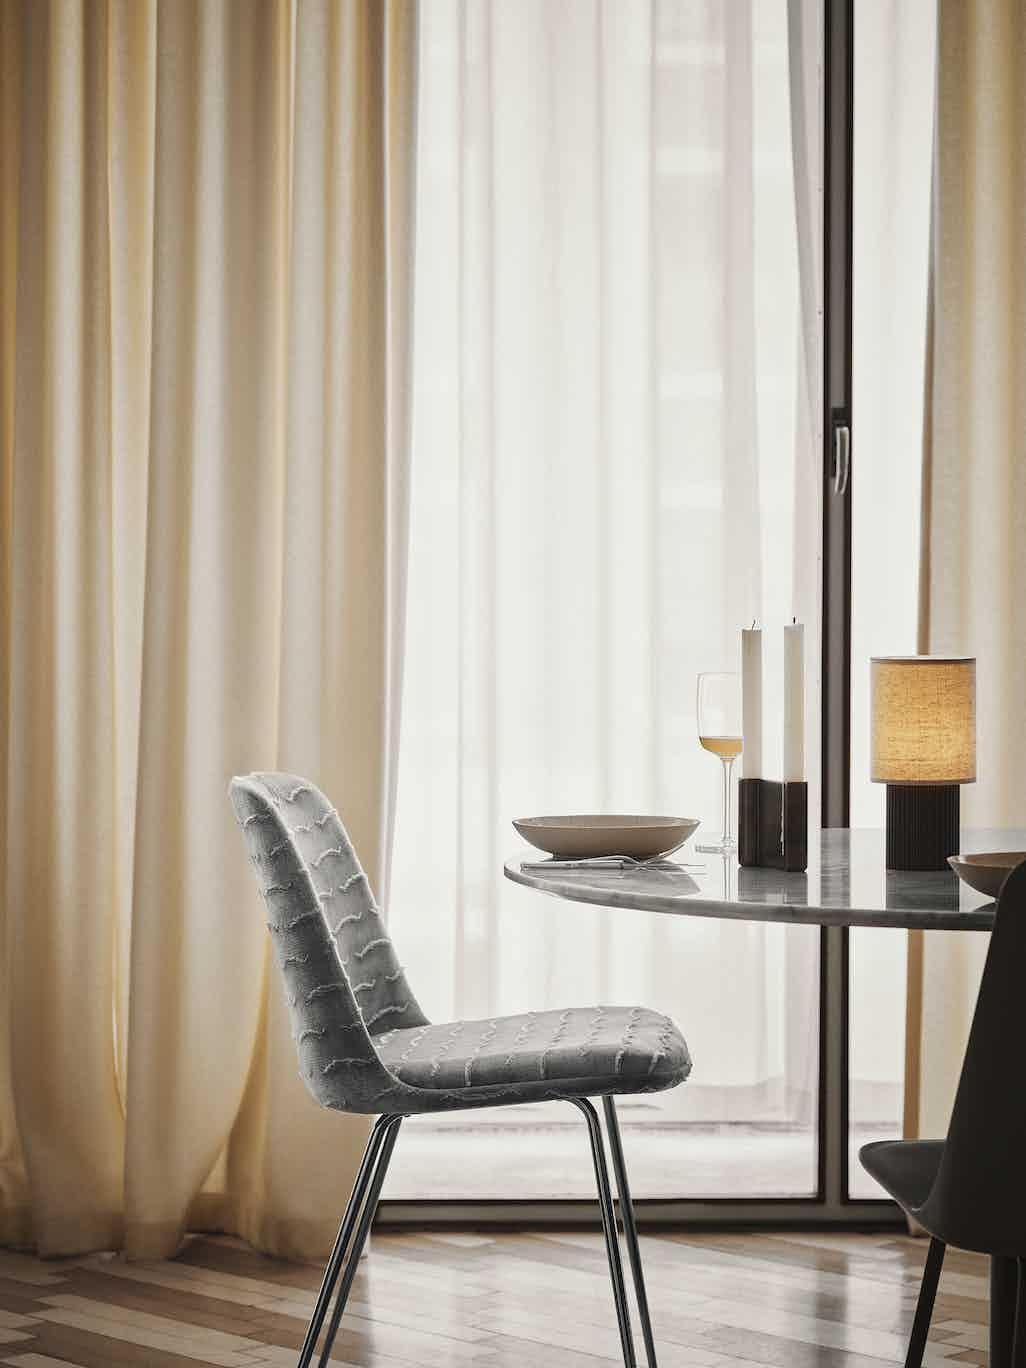 Andtradition manhattan table lamp sc52 lit insitu haute living